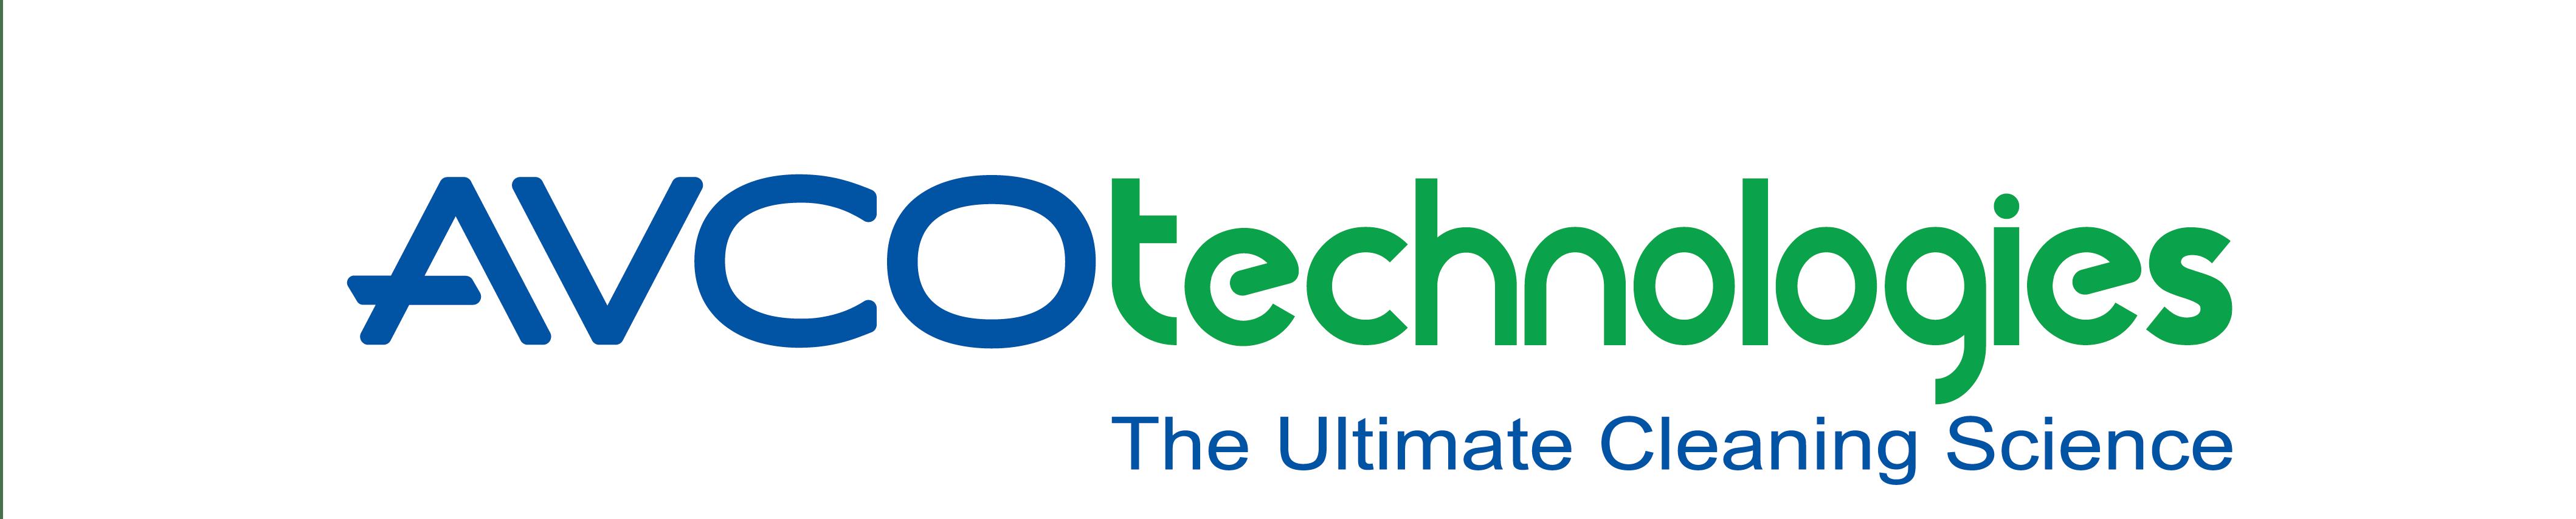 AVCO Technologies